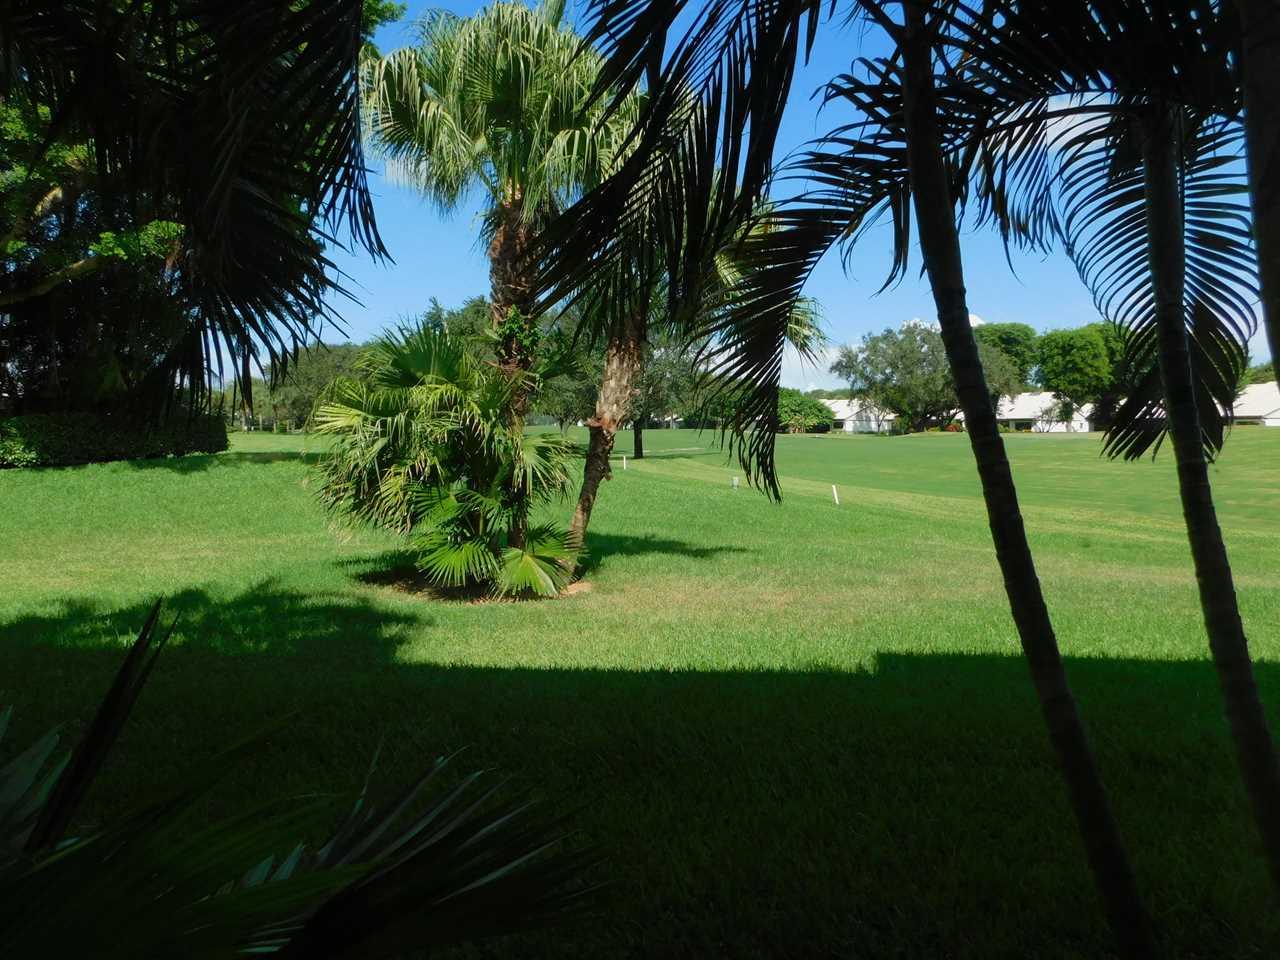 37 Bristol Lane #A Boynton Beach, FL 33436 | MLS RX-10466667 Photo 1